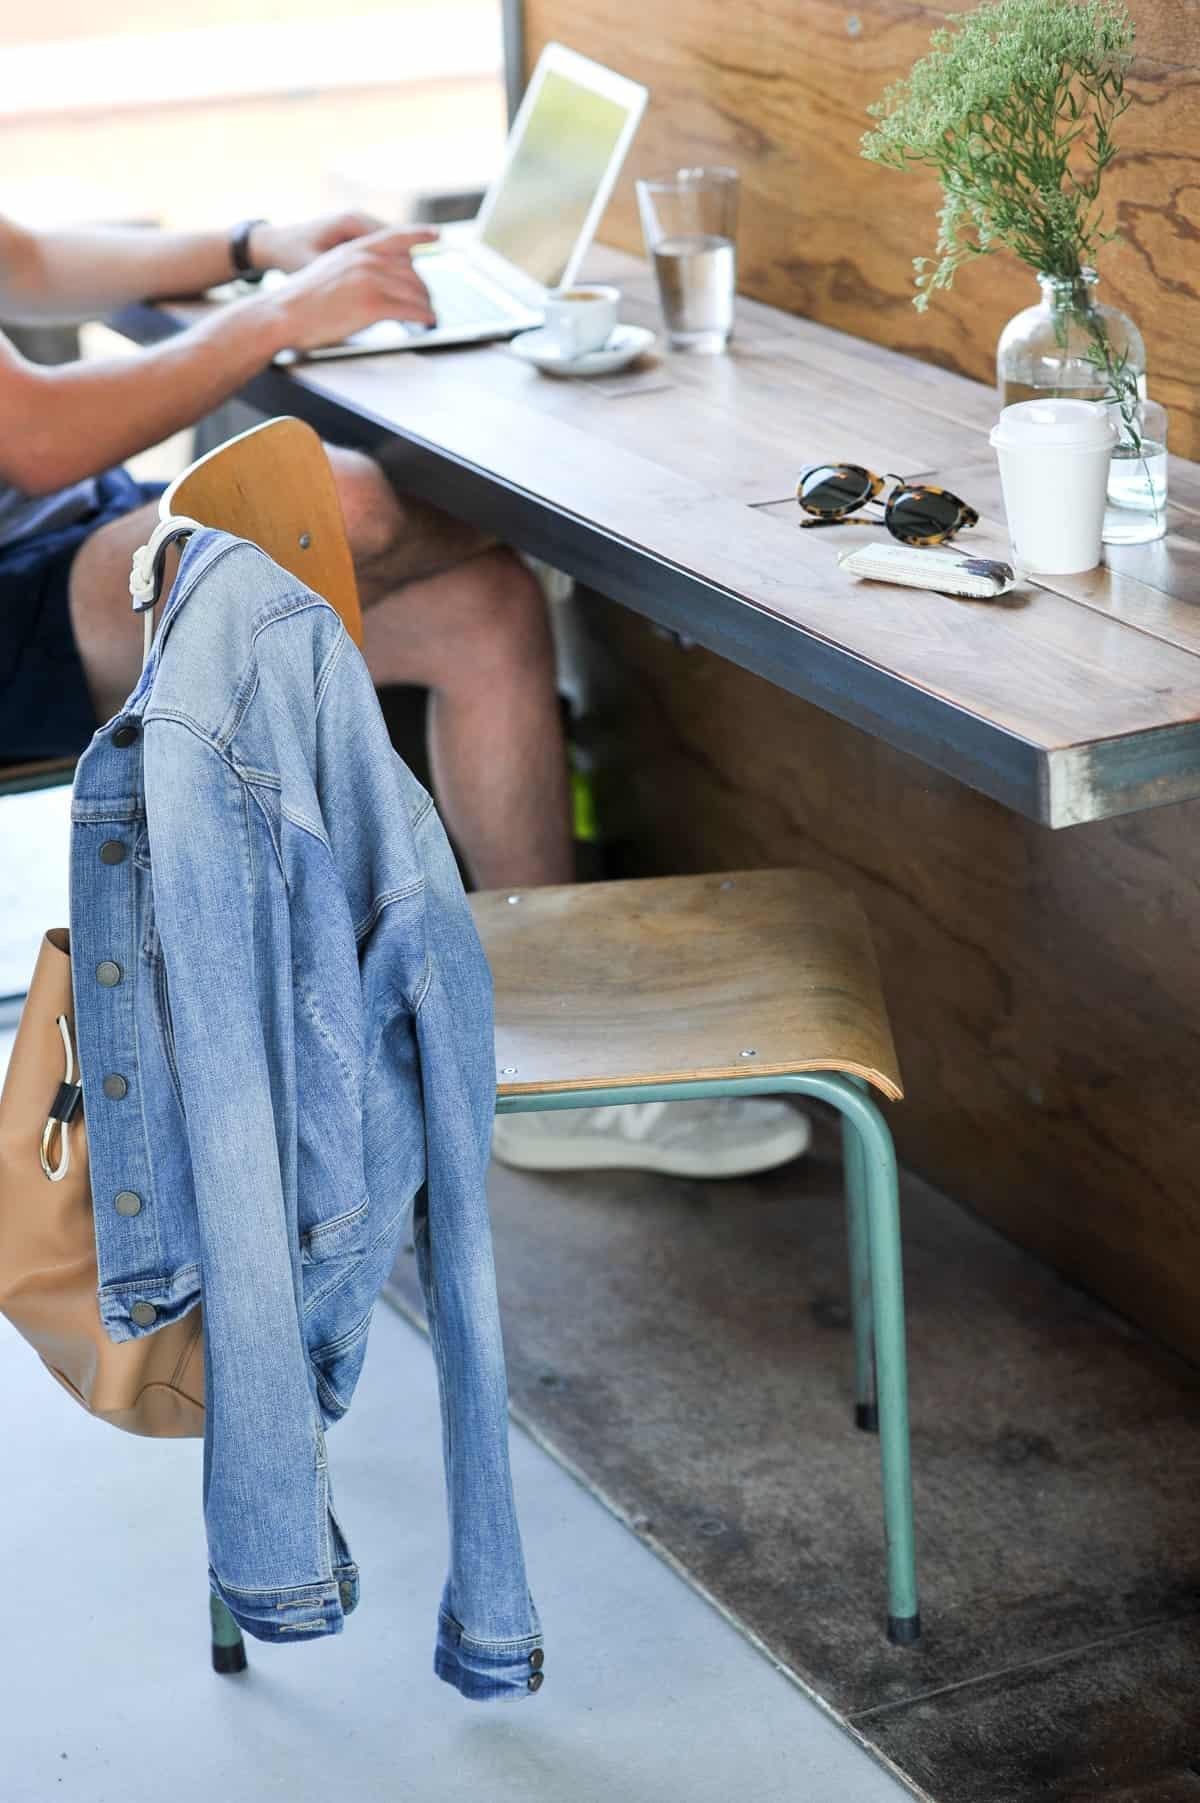 brash coffee shop, best coffee shops in atlanta - My Style Vita @mystylevita